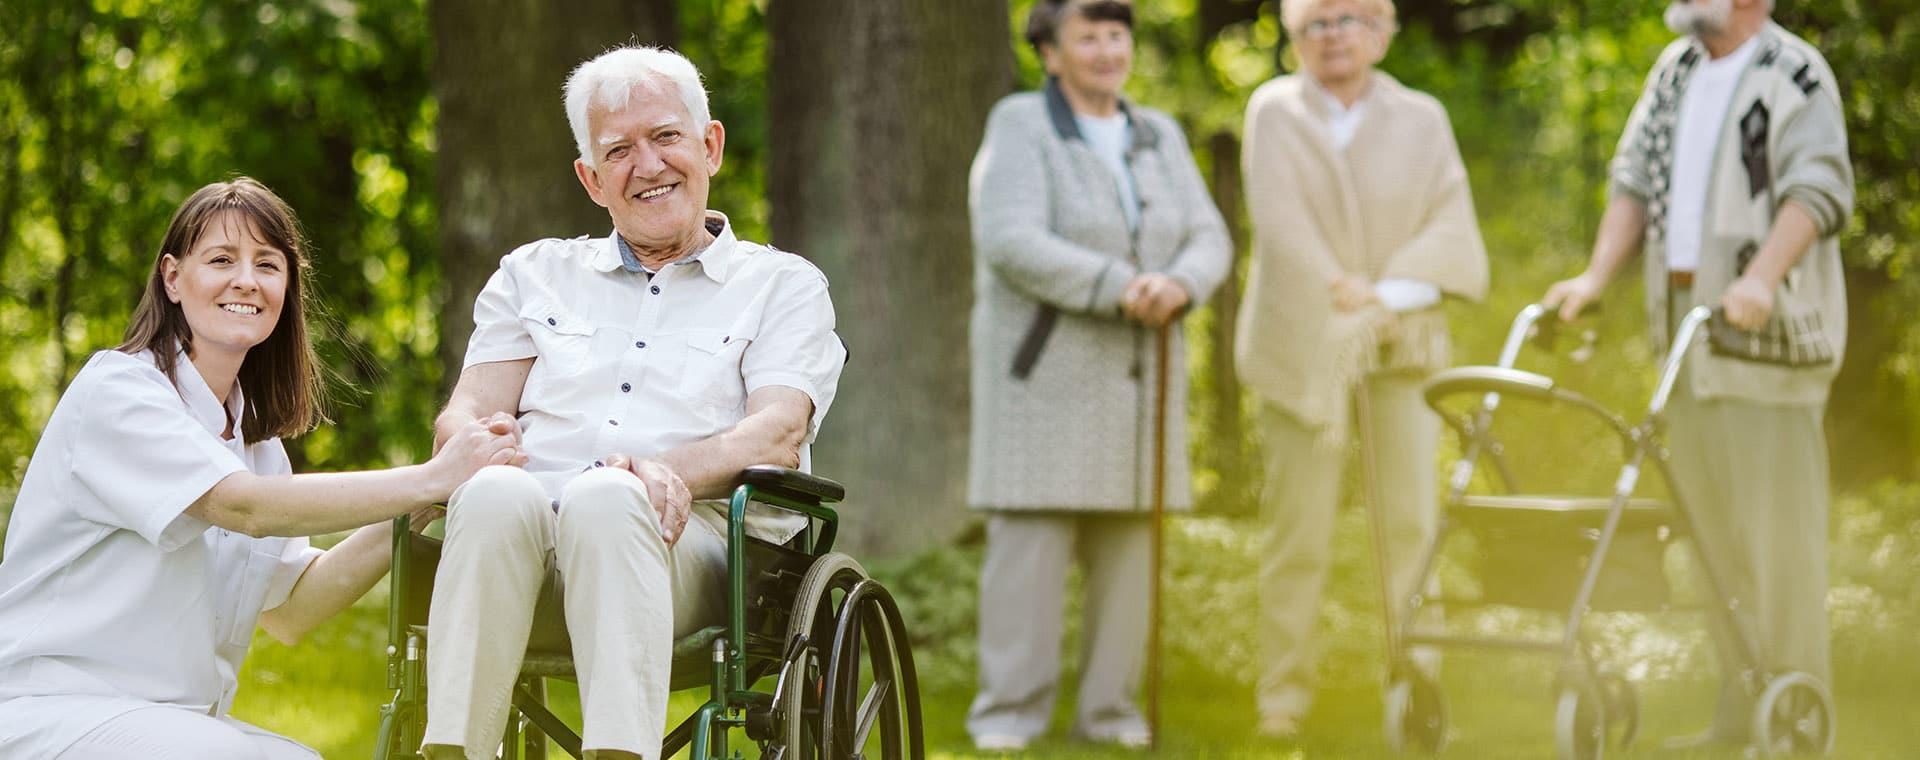 Jungblut Seniorenservice - Pflegeservice